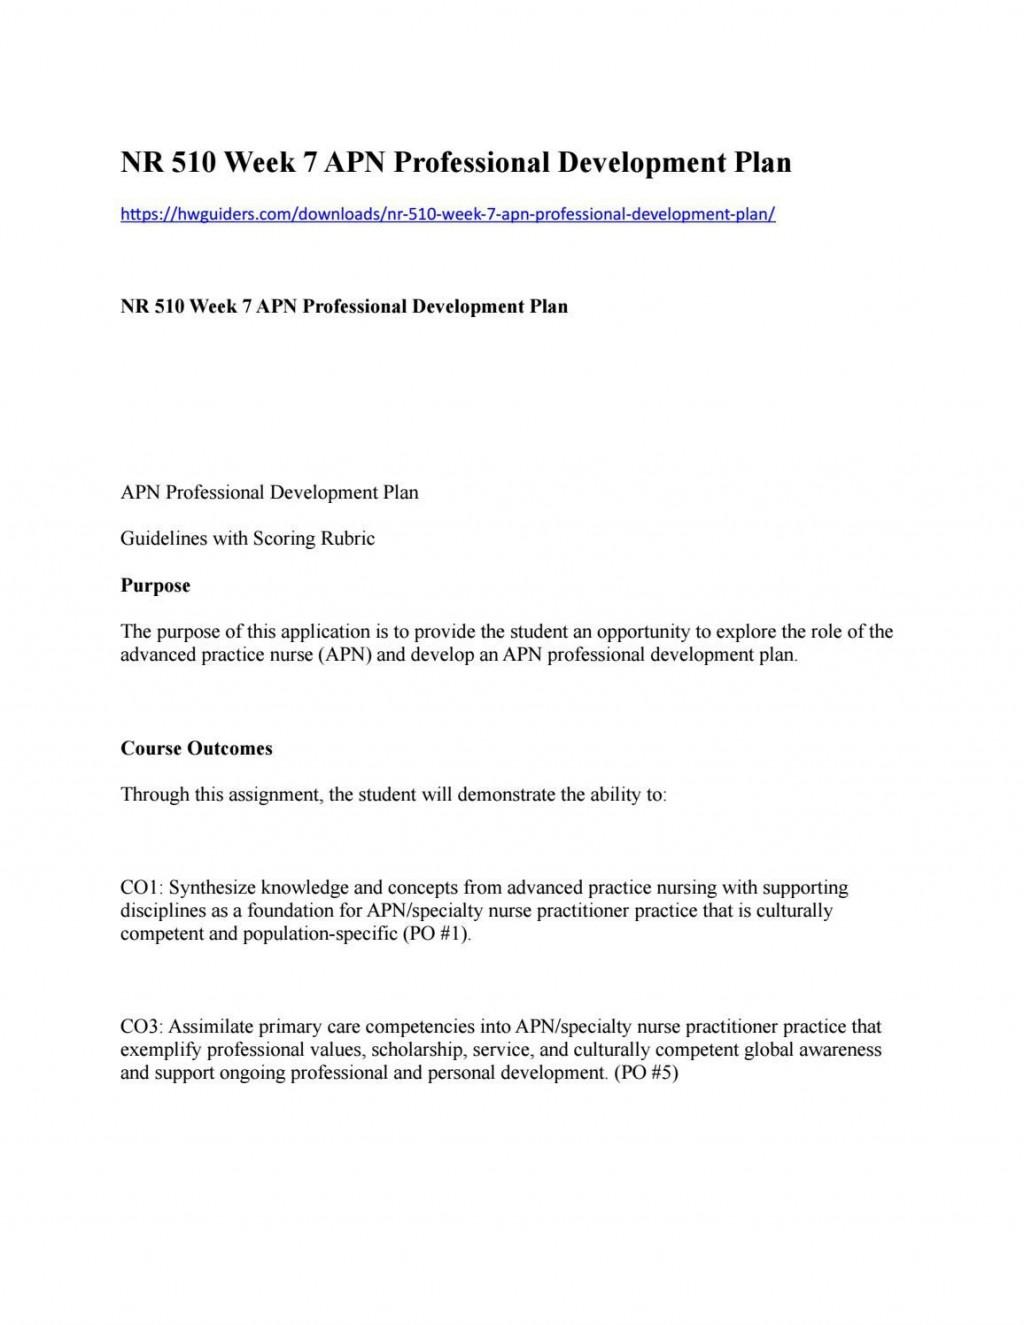 008 Surprising Professional Development Plan Template For Nurse Idea  Nurses Sample Goal ExampleLarge